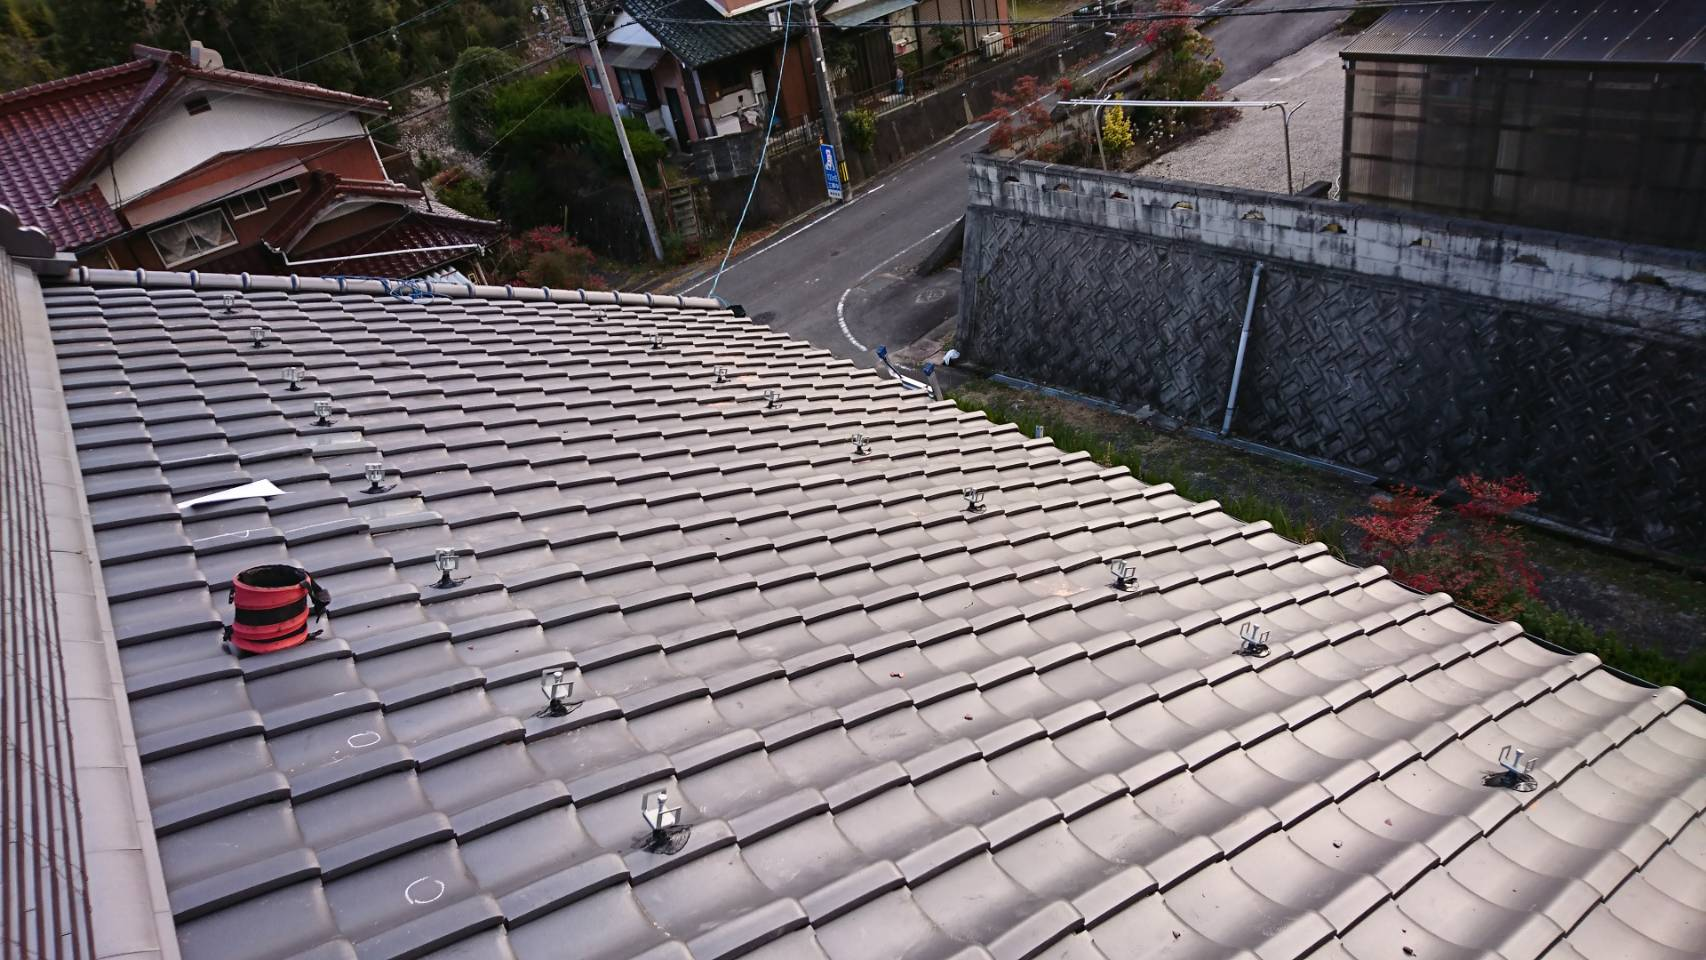 大阪府長州太陽光パネルCS-274B61施工前の写真